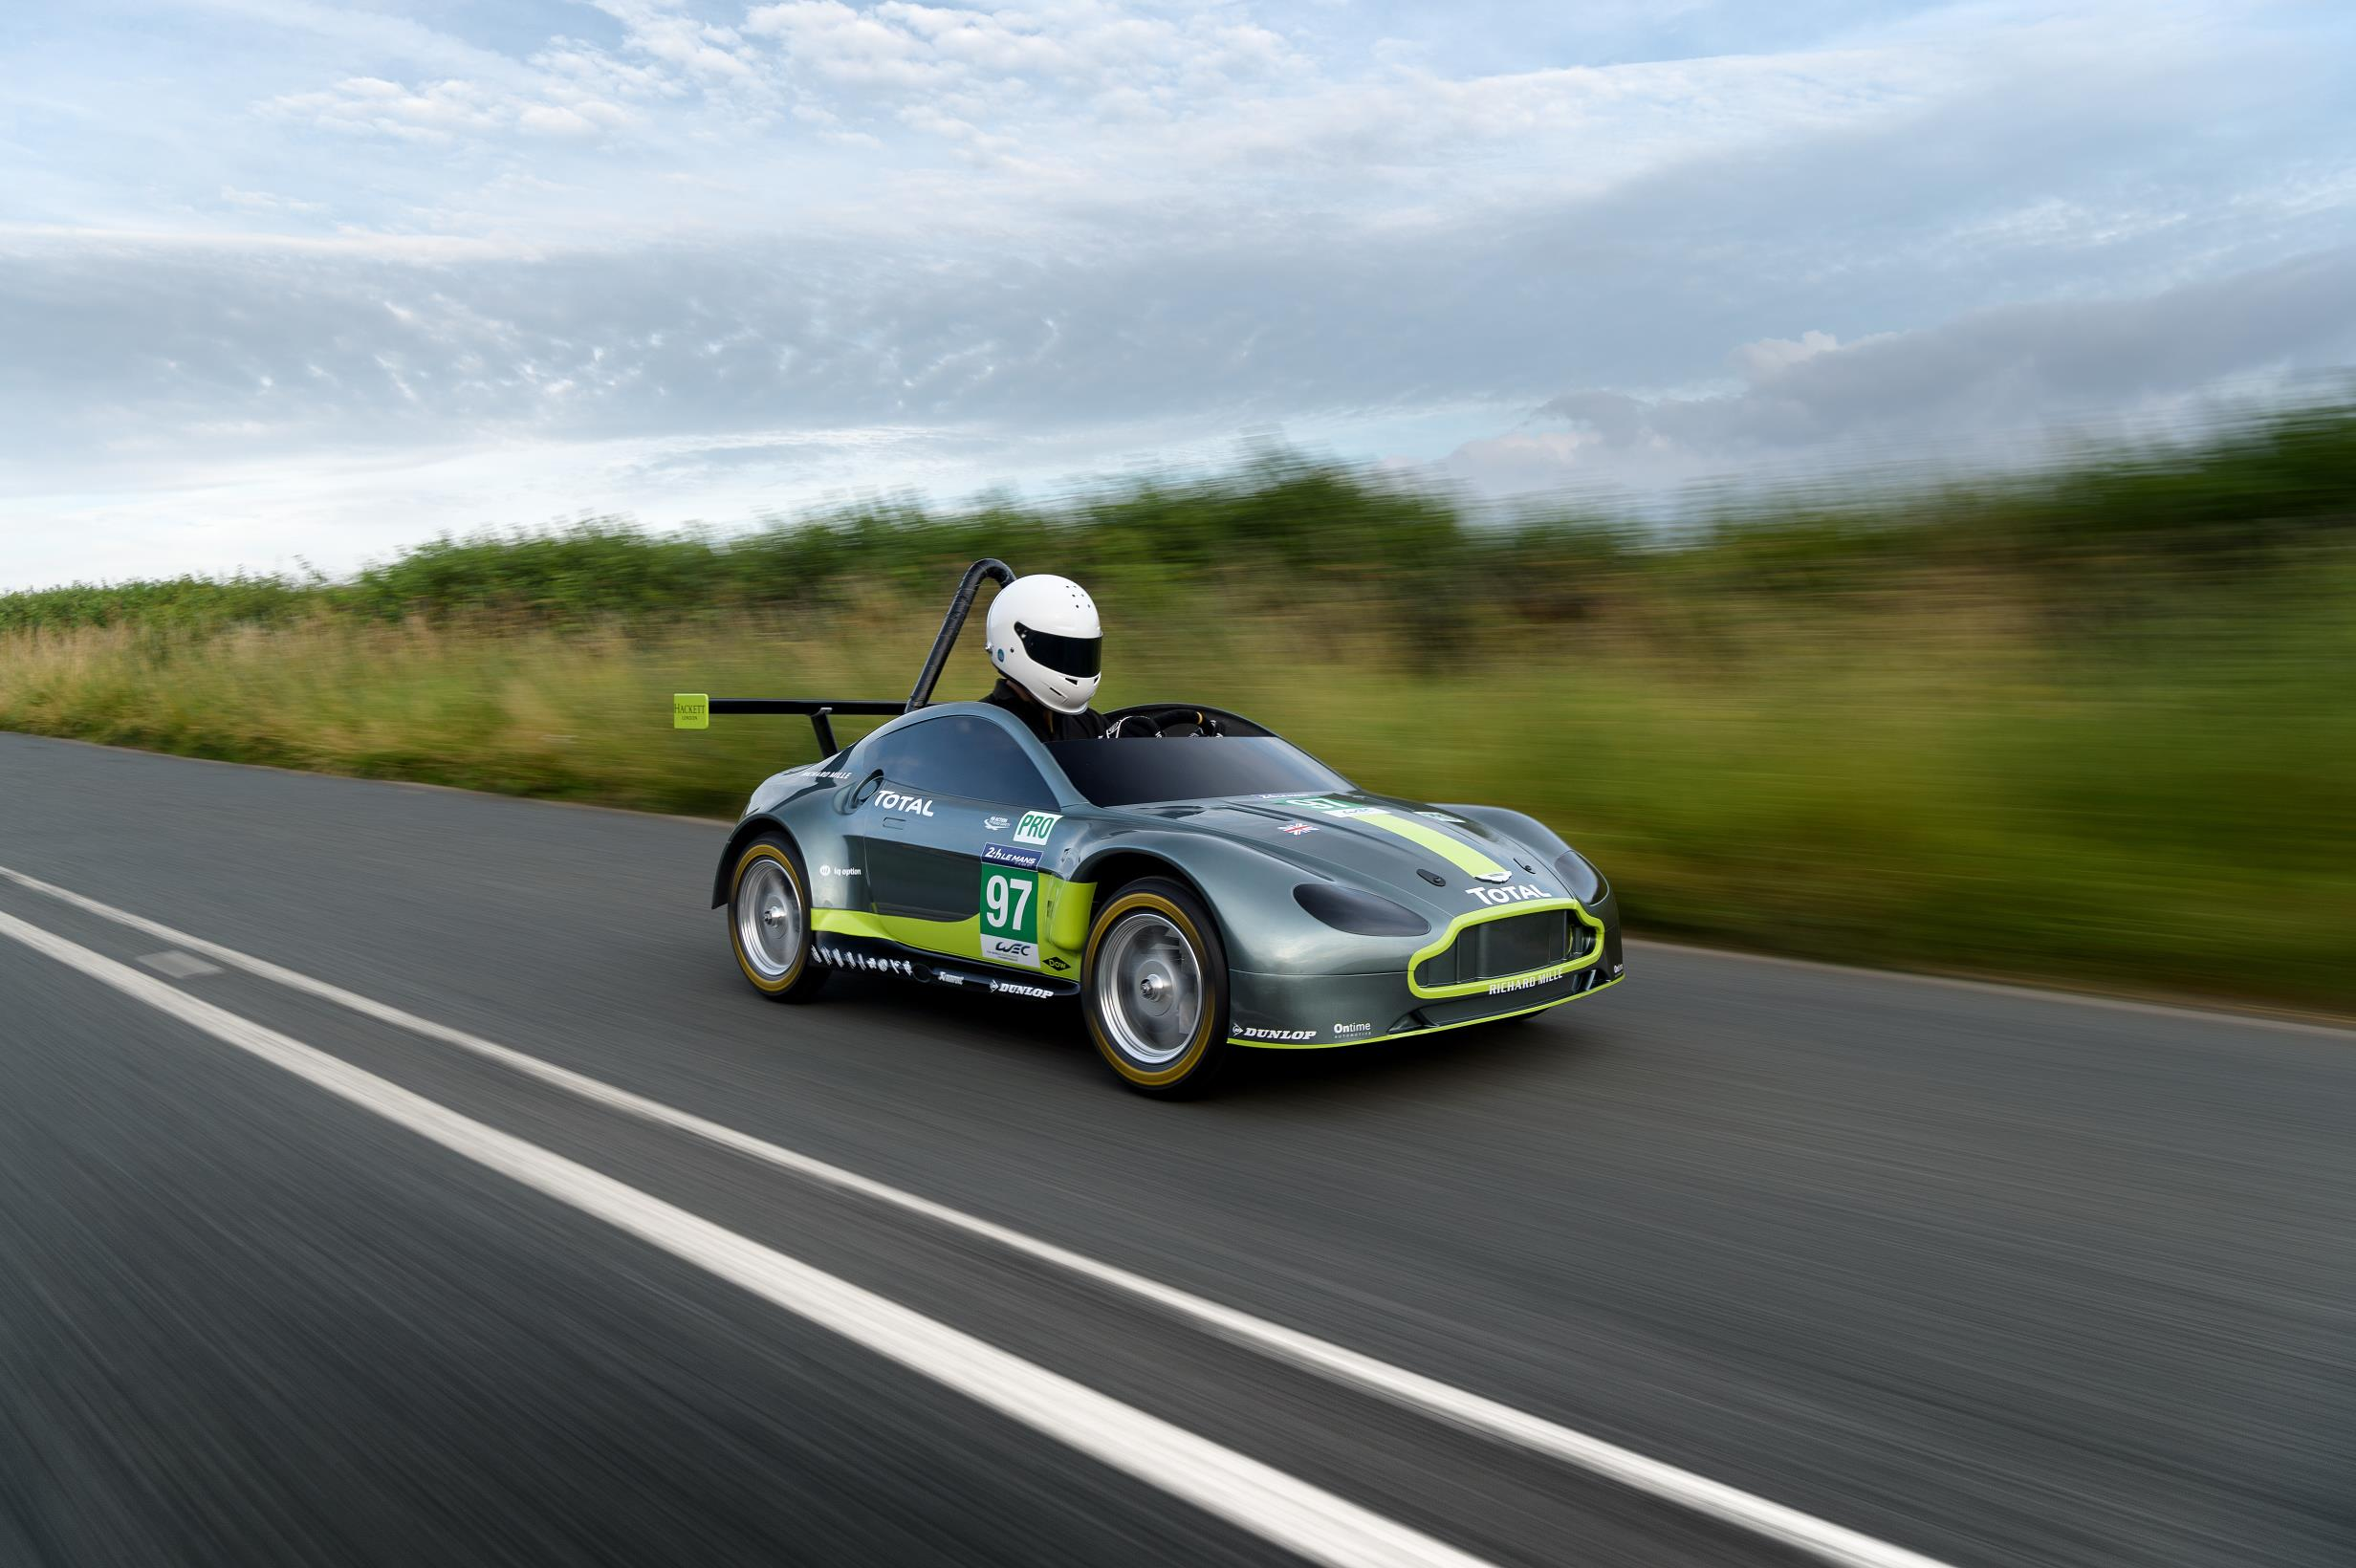 Aston Martin Racing Set To Reveal New Race Car This Weekend Endurance Info English Spoken